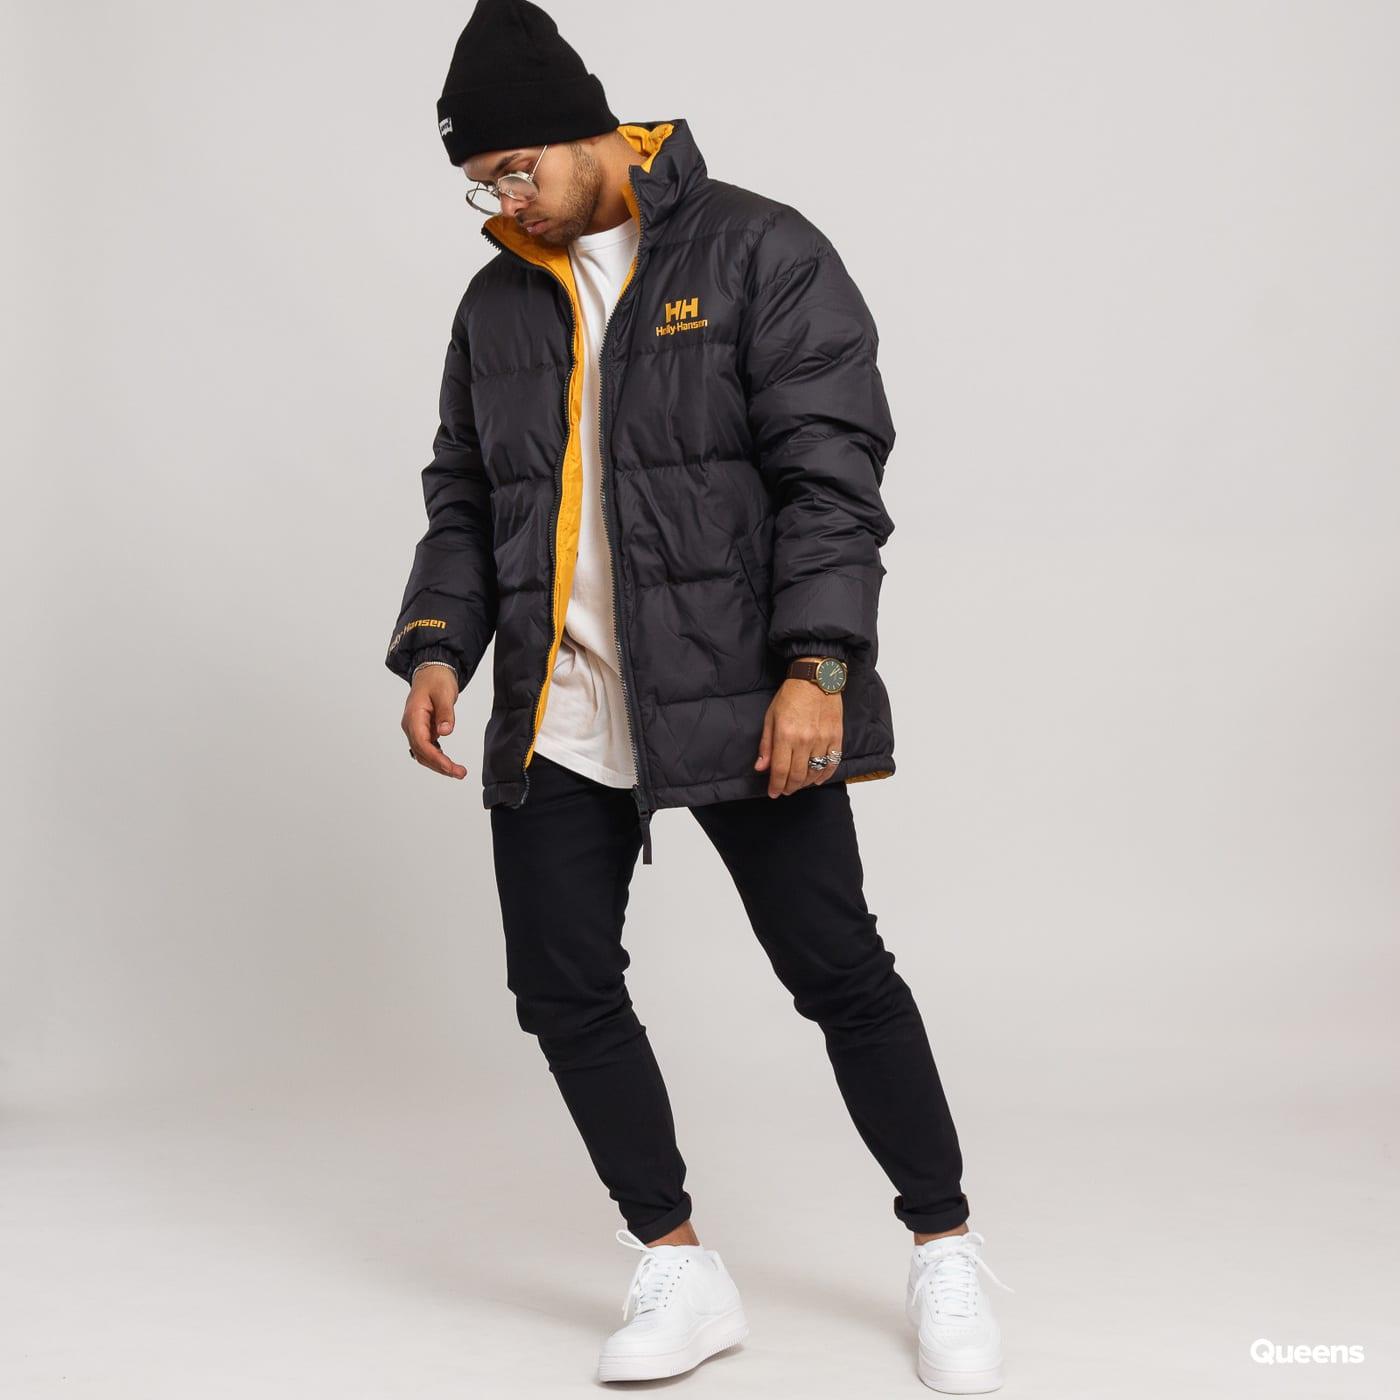 Pánská zimní bunda Helly Hansen HH Reversible Down Jacket (53182 980) –  Queens 💚 5591649a2d